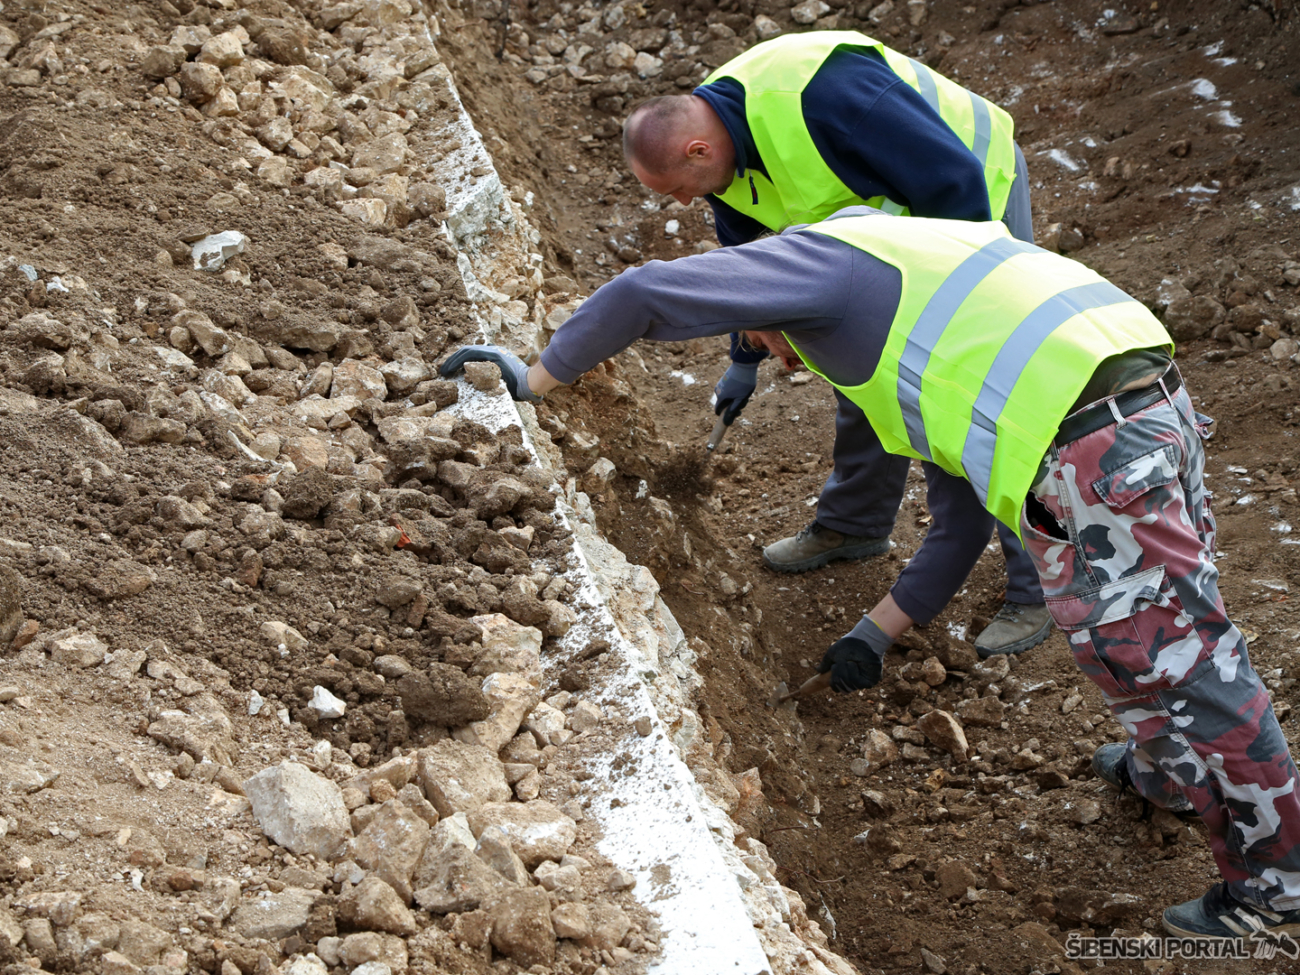 poljana radovi arheolozi 020217 9